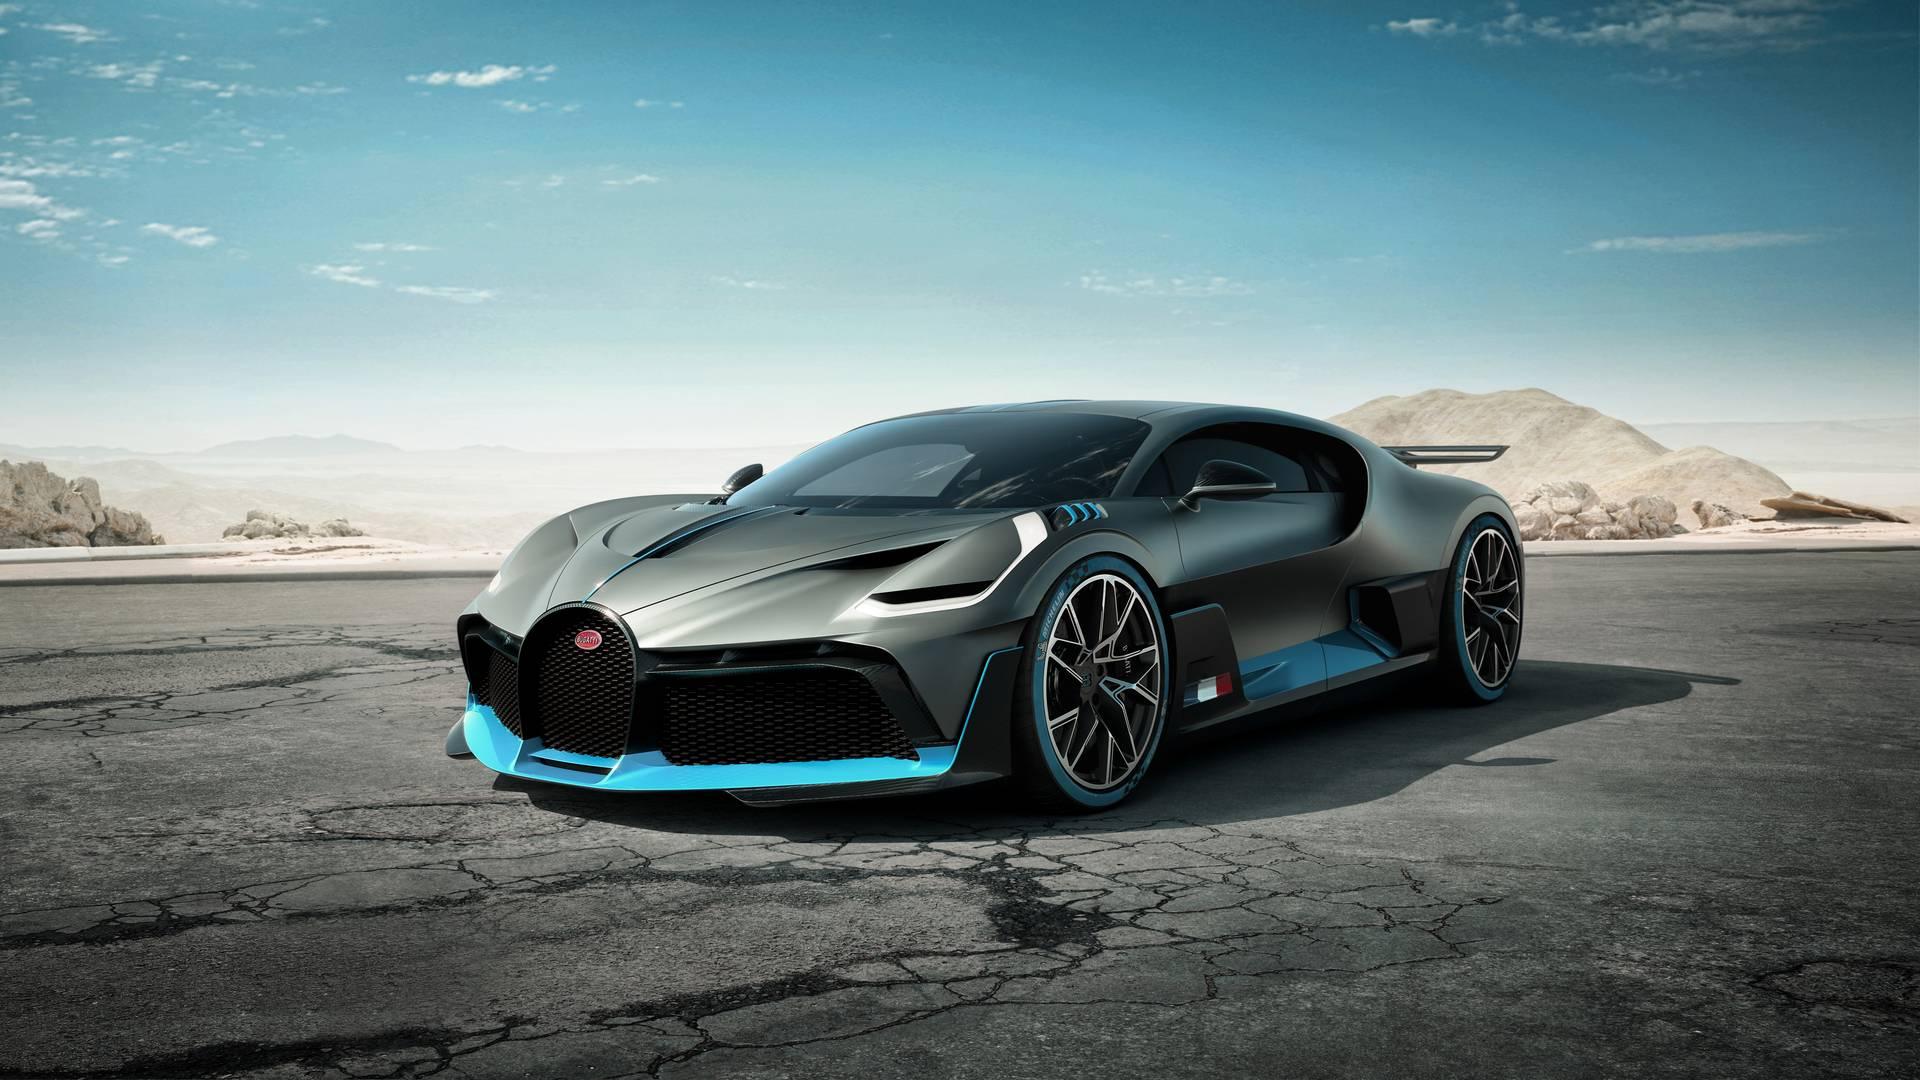 Bugatti Divo Revealed: $6 Million Hypercar Built for Corners